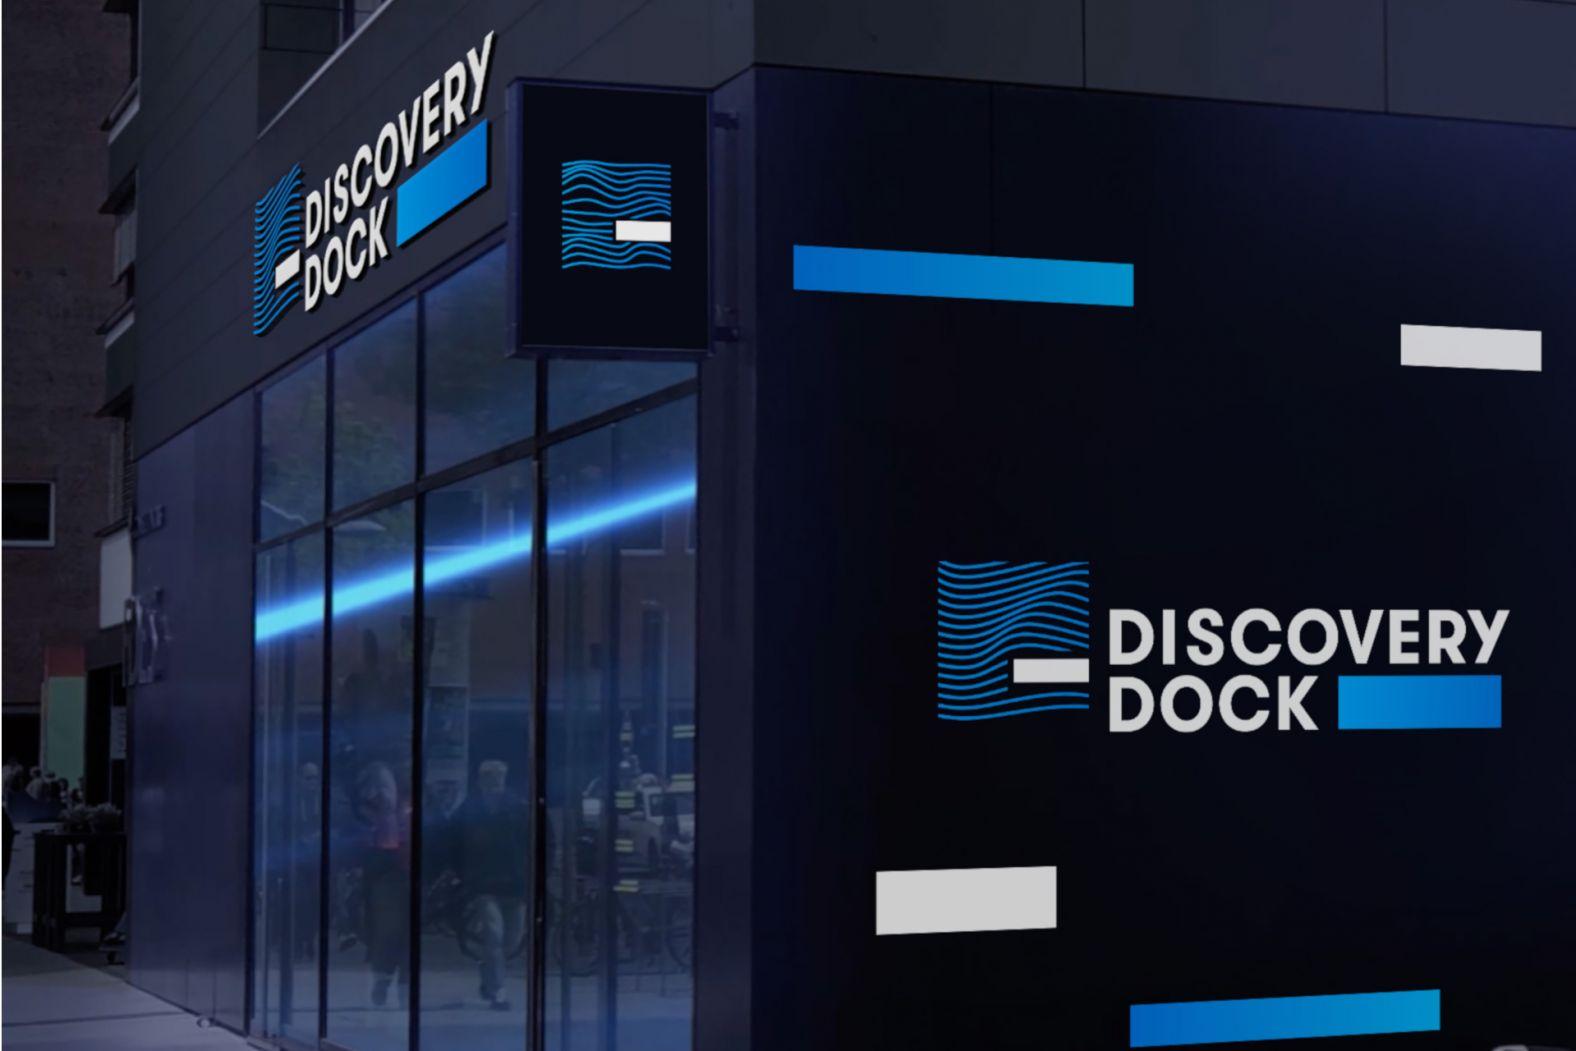 Bild des Discovery Docks